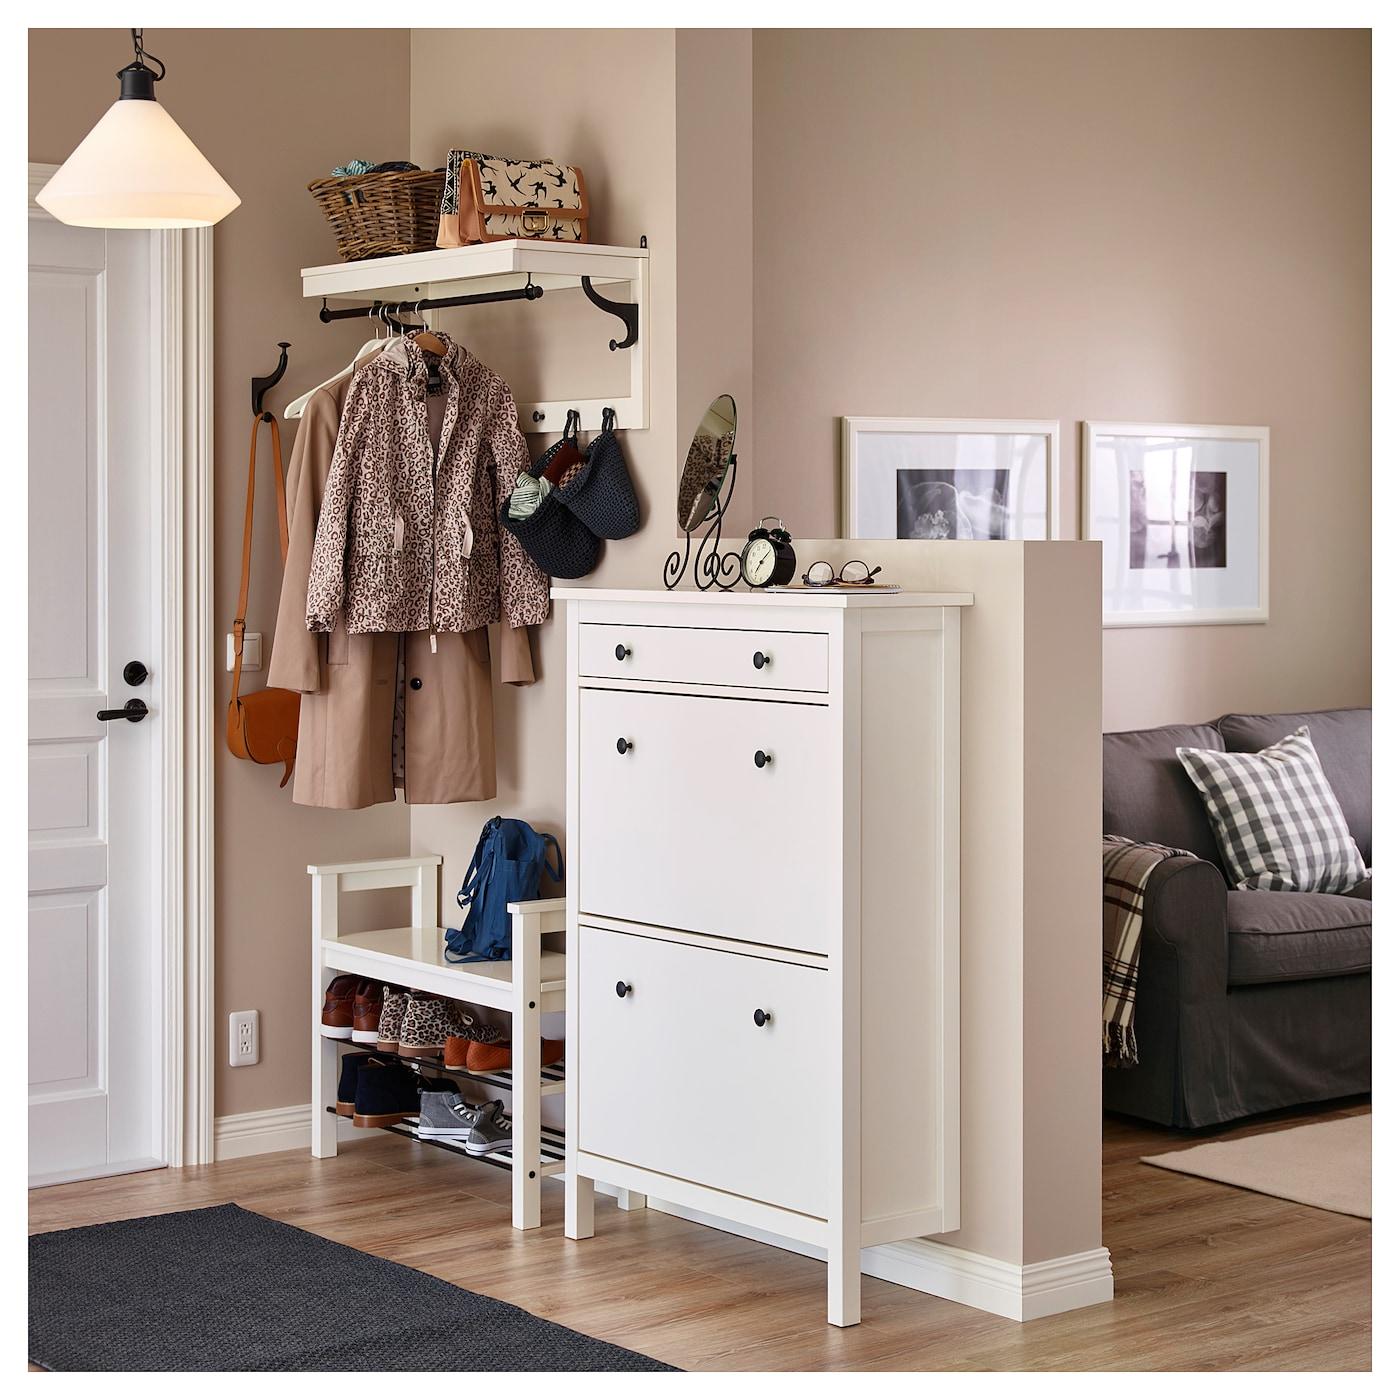 hemnes armoire chaussures 2 casiers blanc 89x127 cm ikea. Black Bedroom Furniture Sets. Home Design Ideas